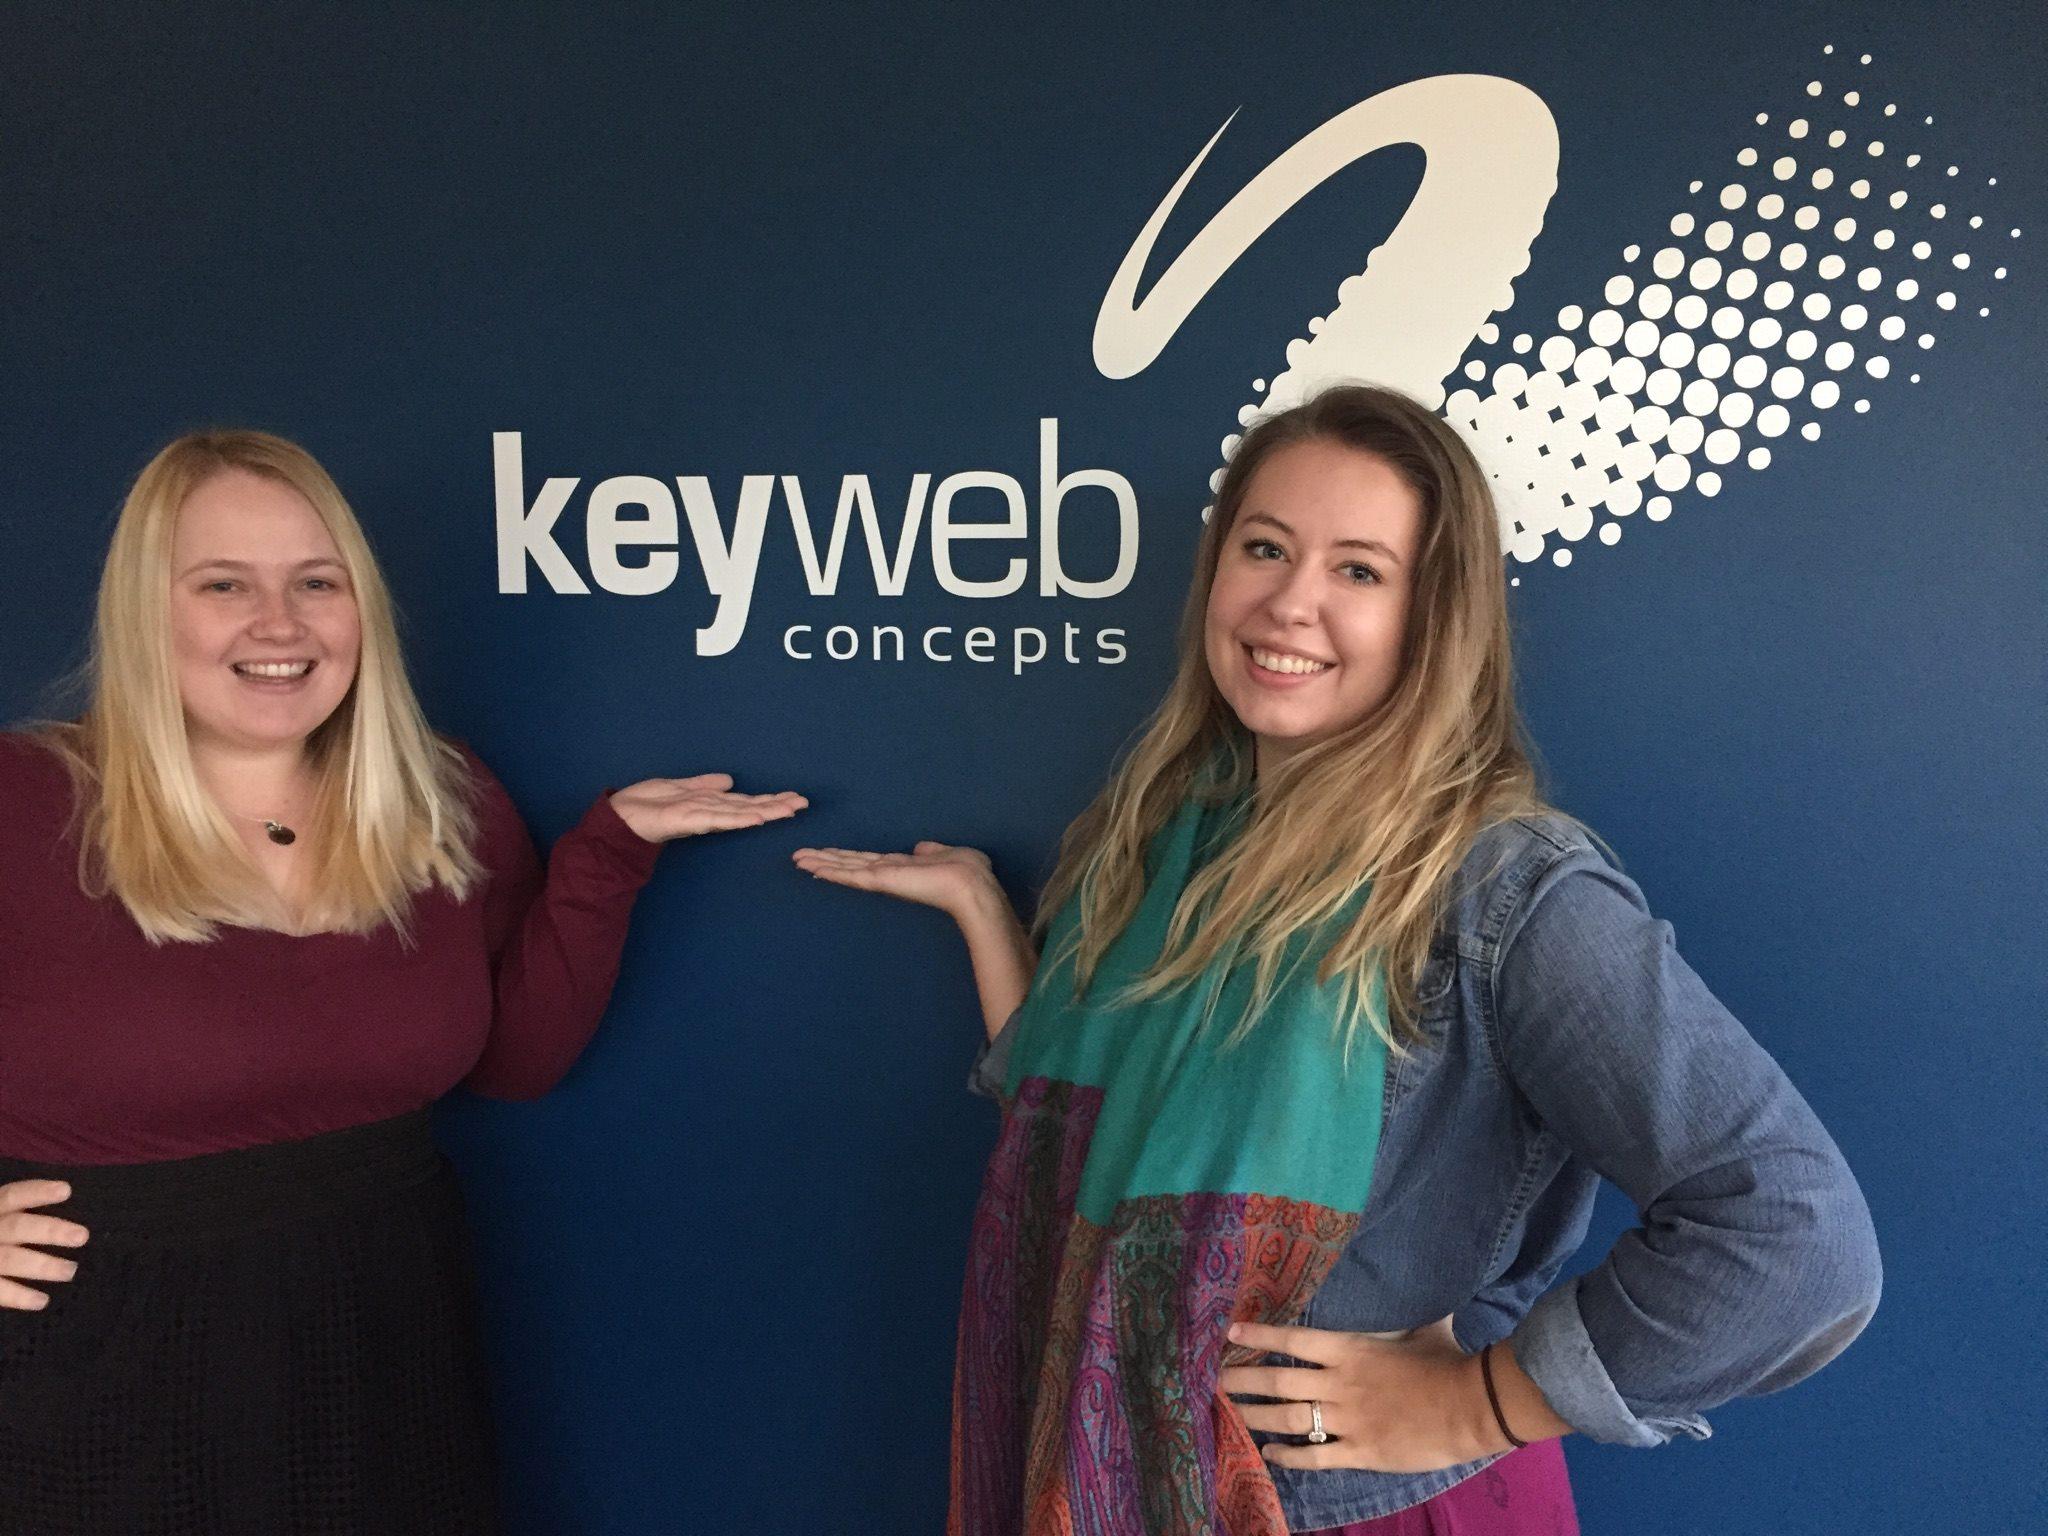 key web concepts webinar, richmond va